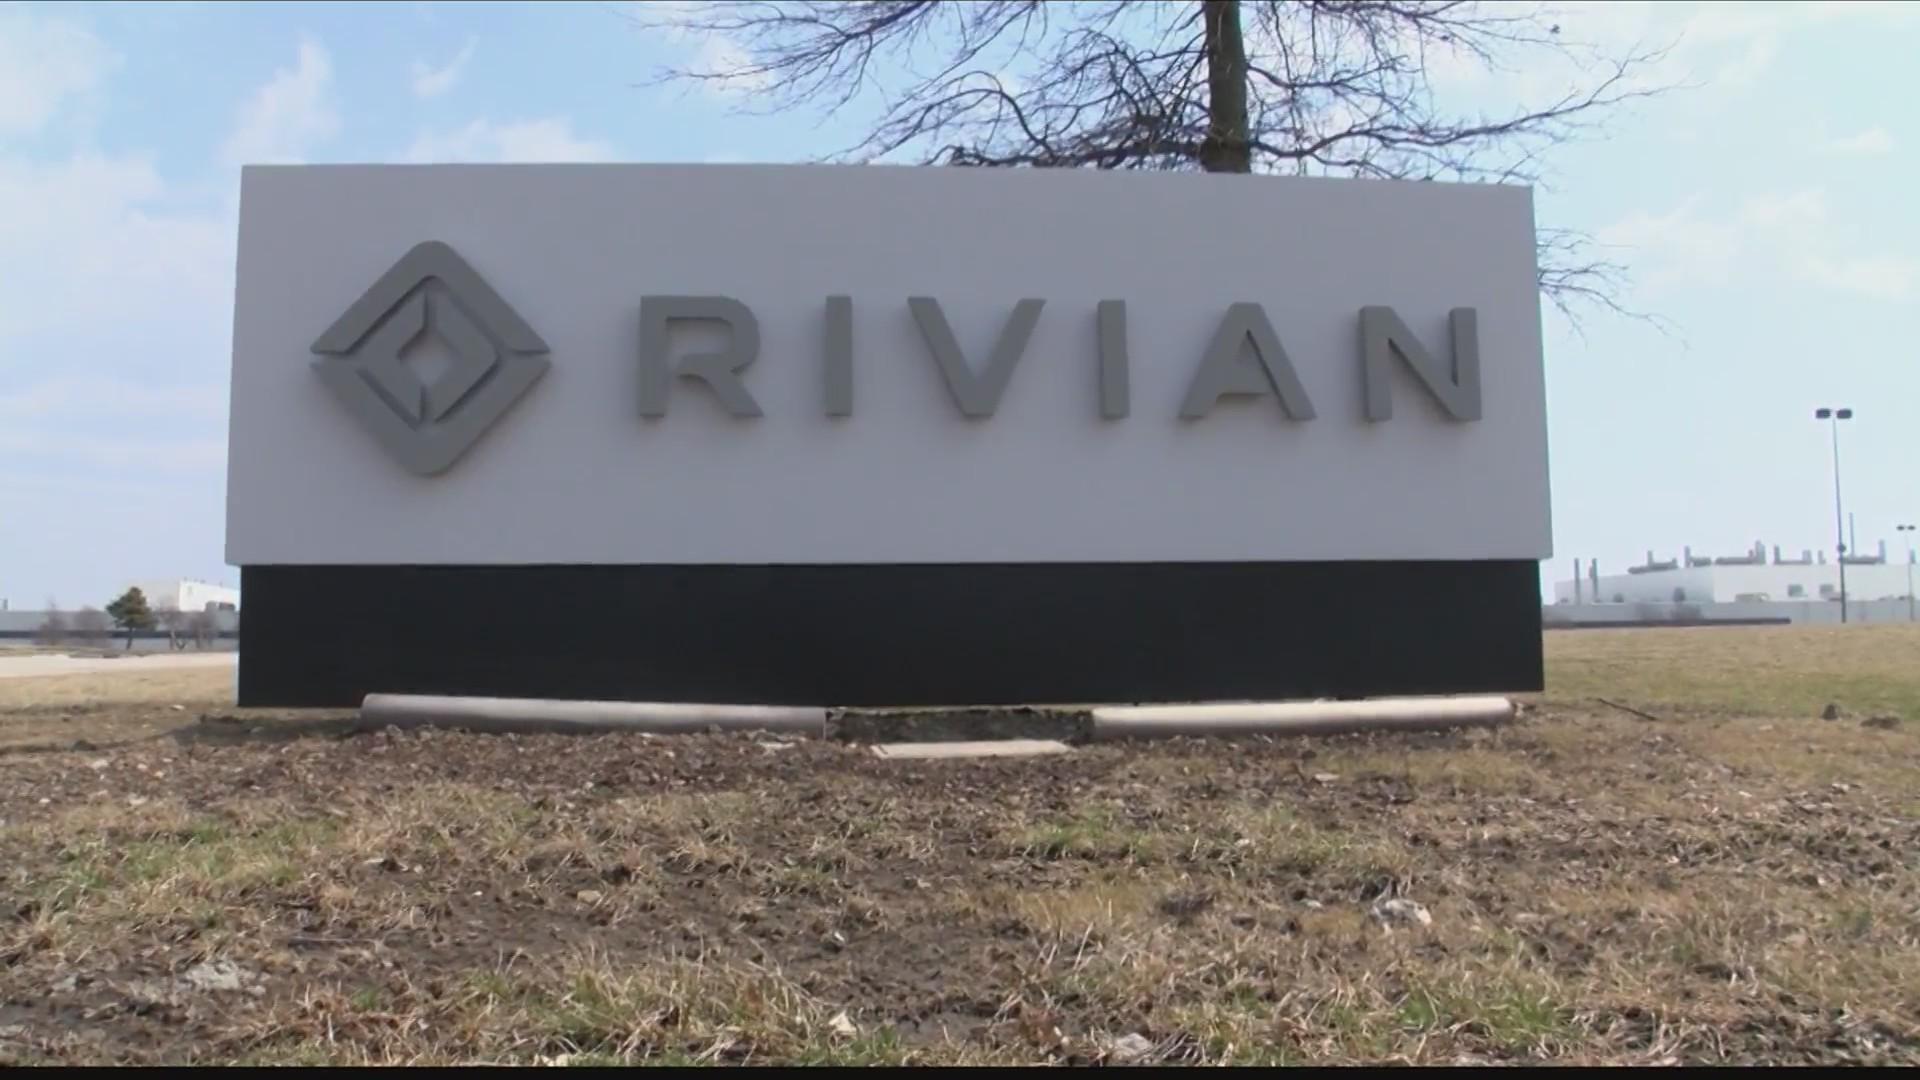 Rivian Automotive